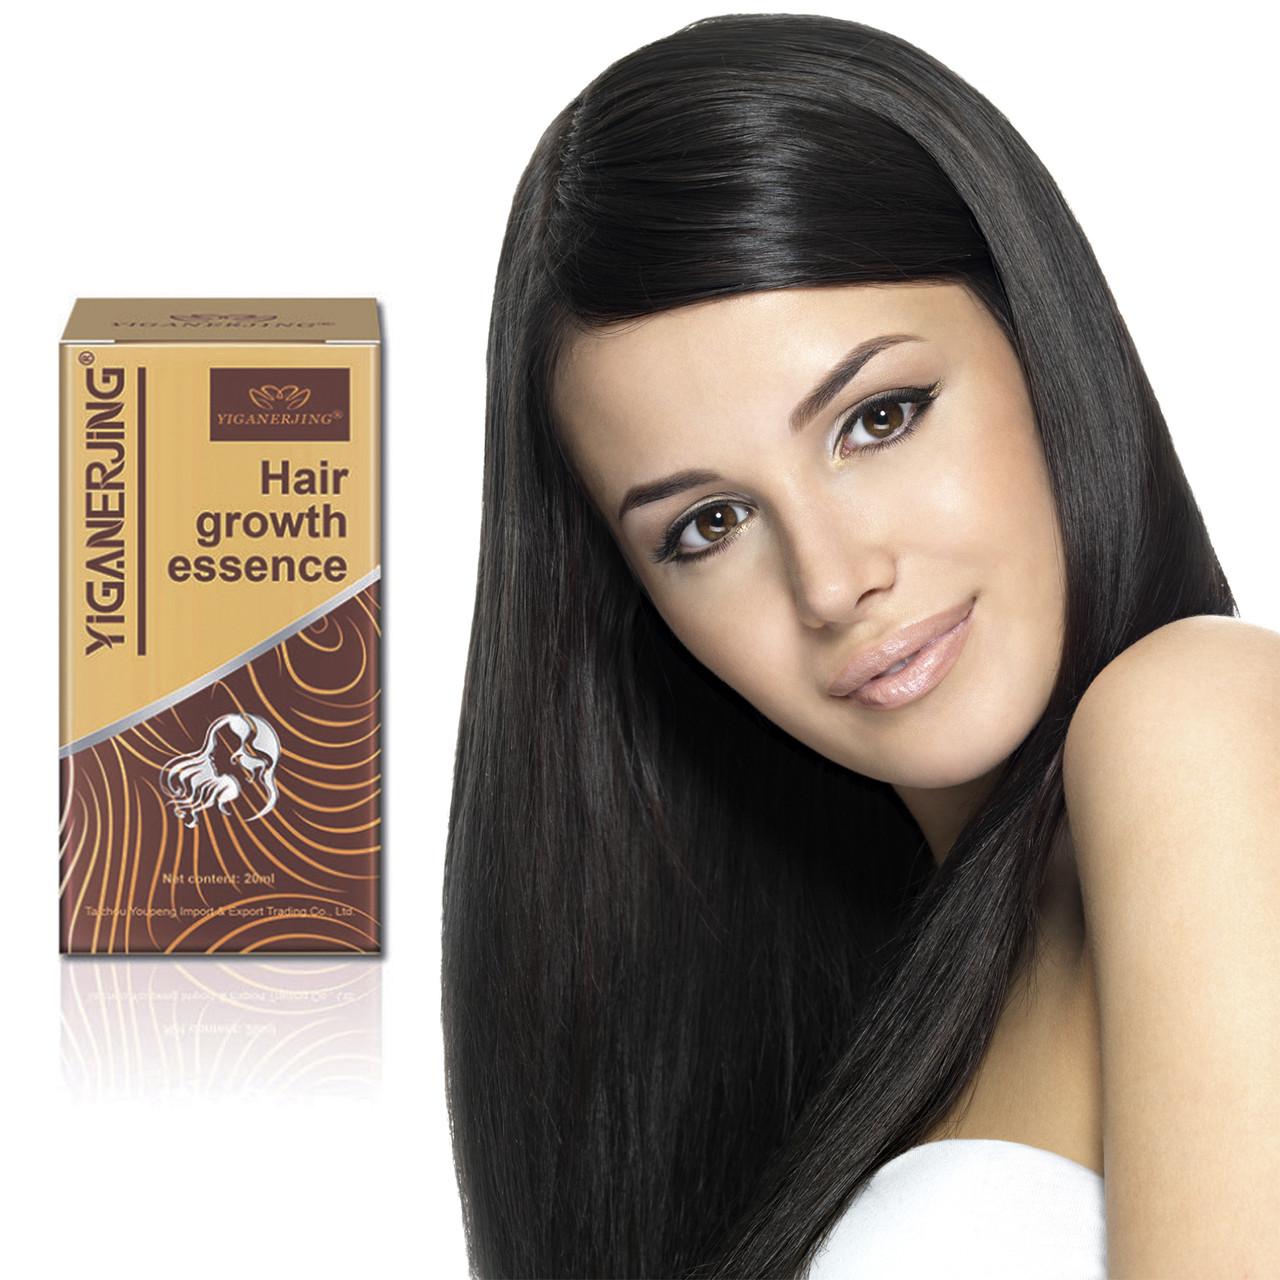 Емульсія для росту волосся Yiganerjing